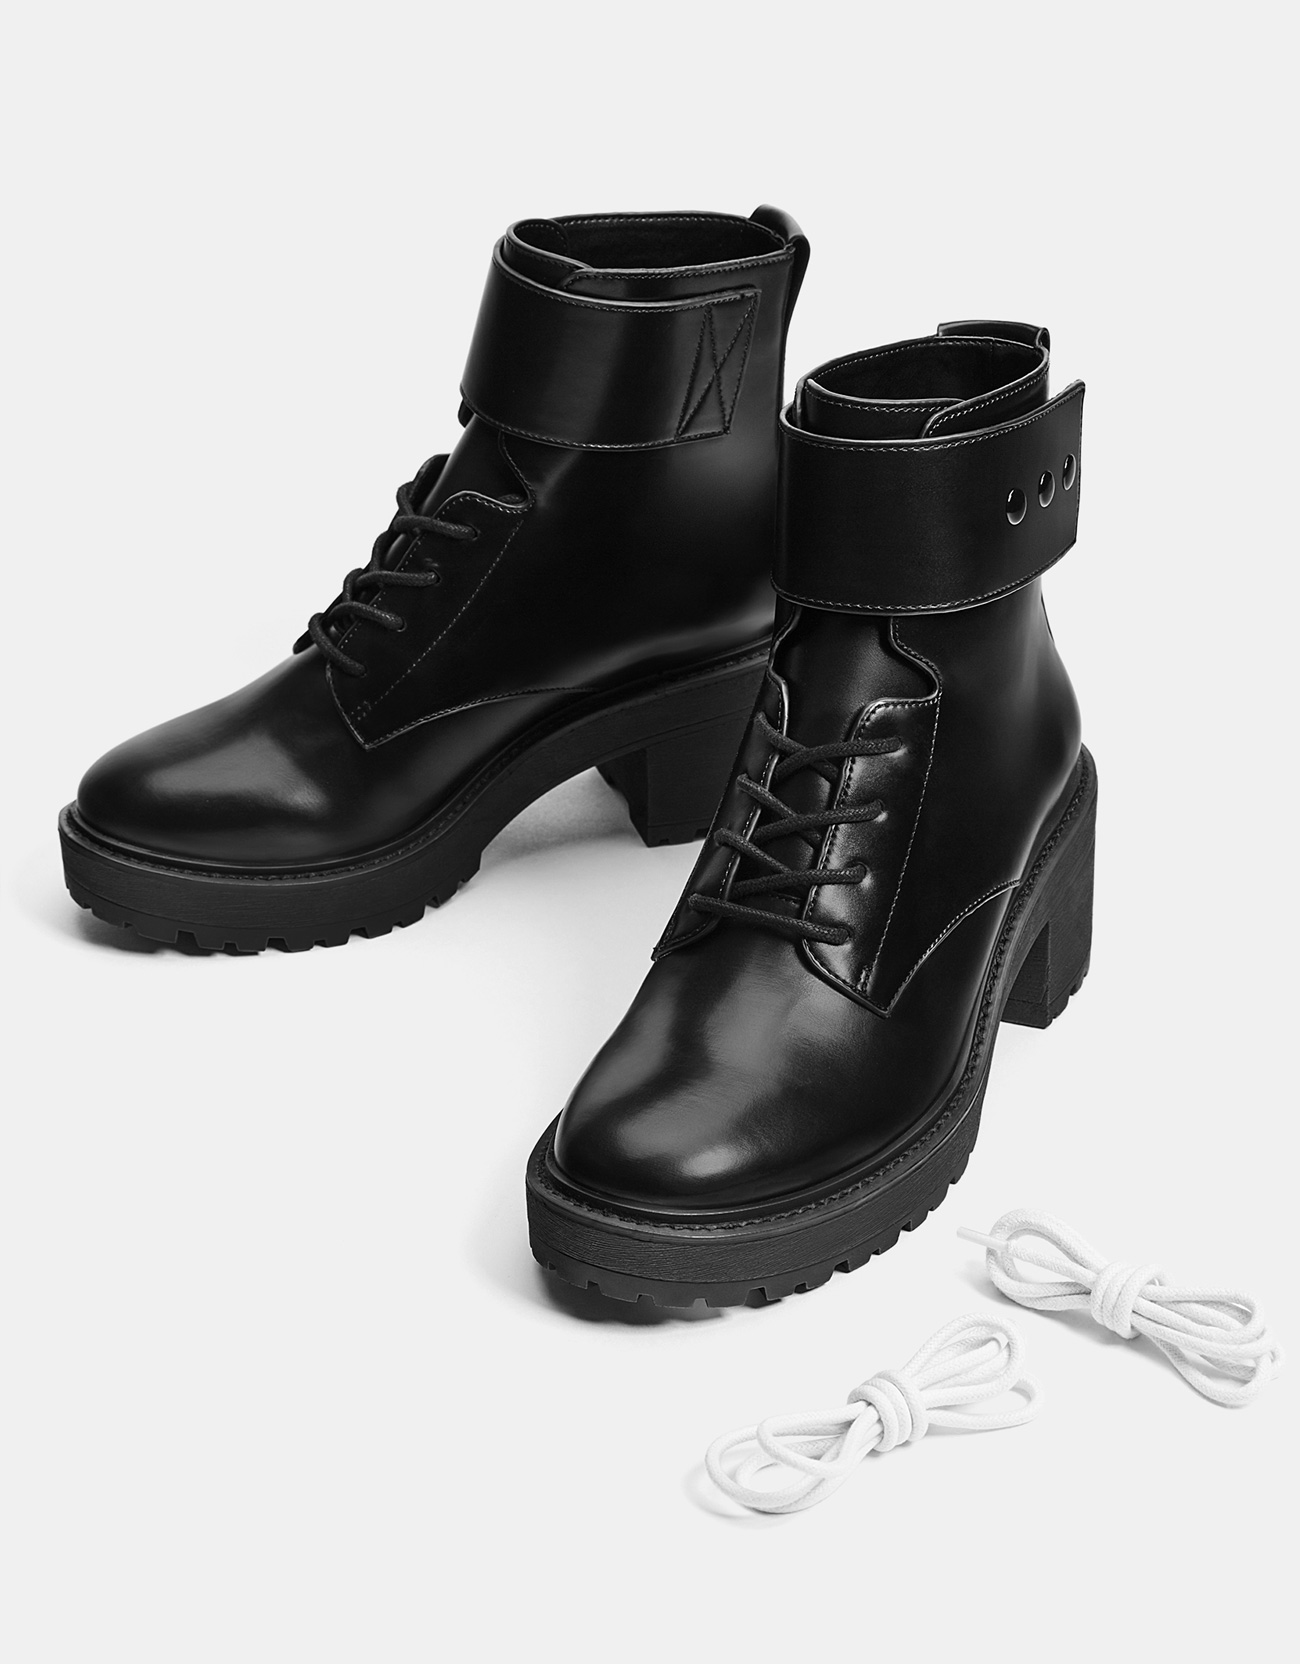 2553059921e Mid-heel platform ankle boots - New - Bershka Indonesia